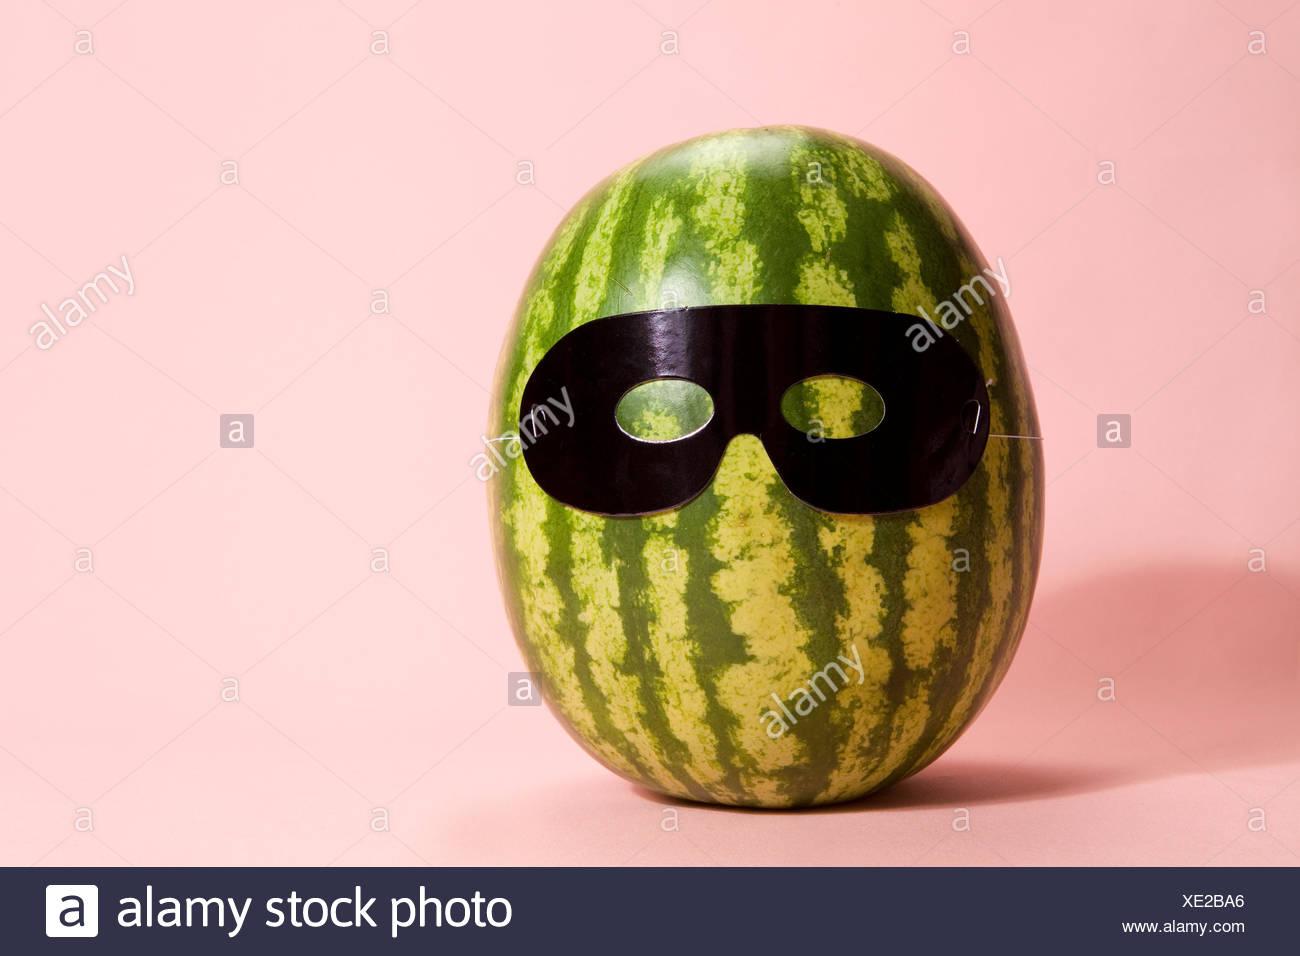 Superwatermelon wearing a black mask - Stock Image